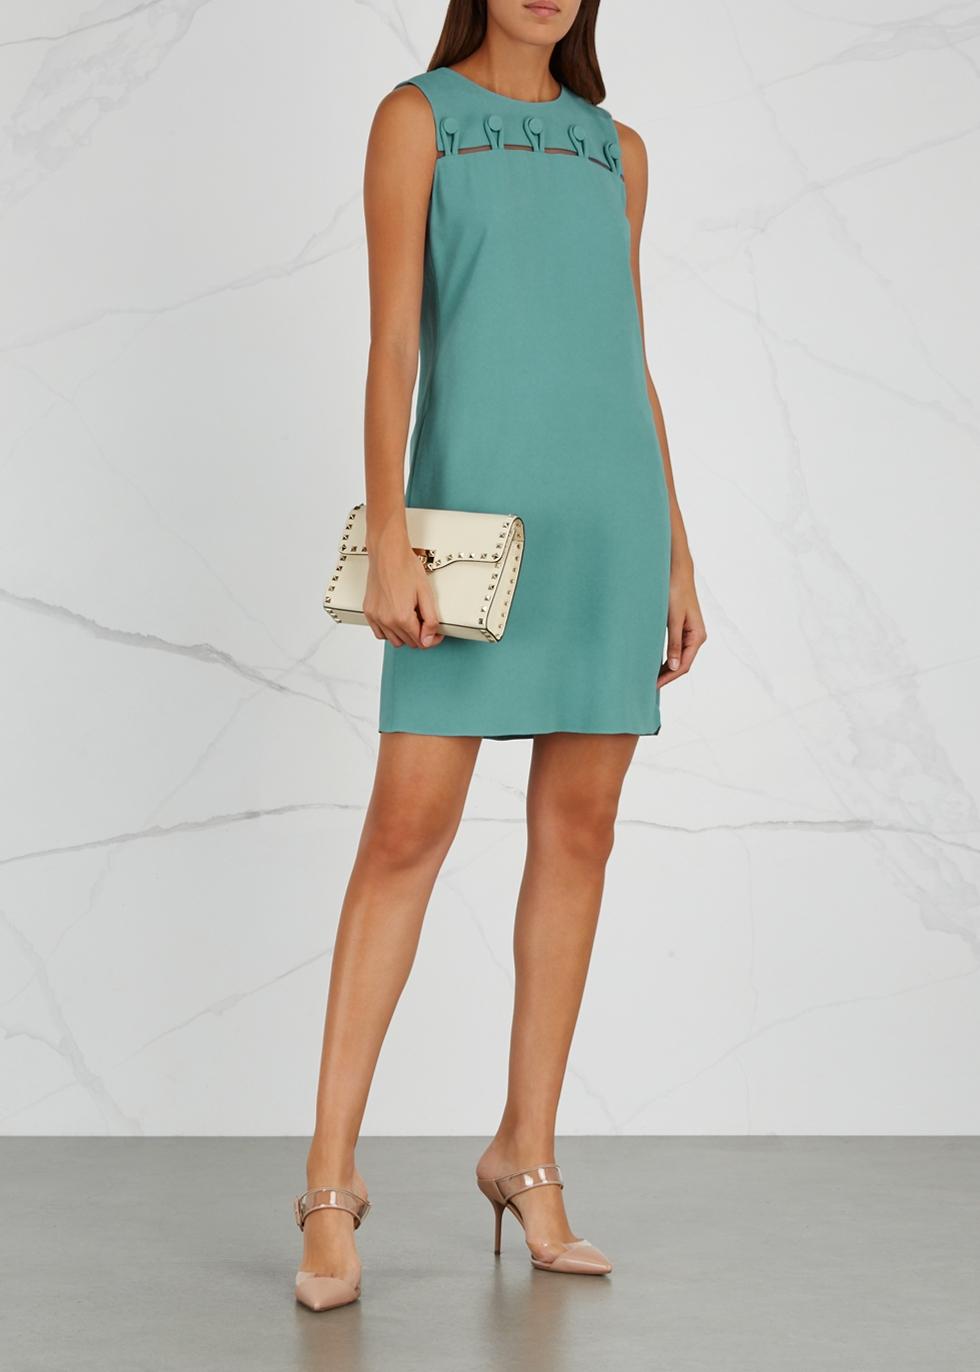 Luxury Wedding Outfits & Accessories - Harvey Nichols